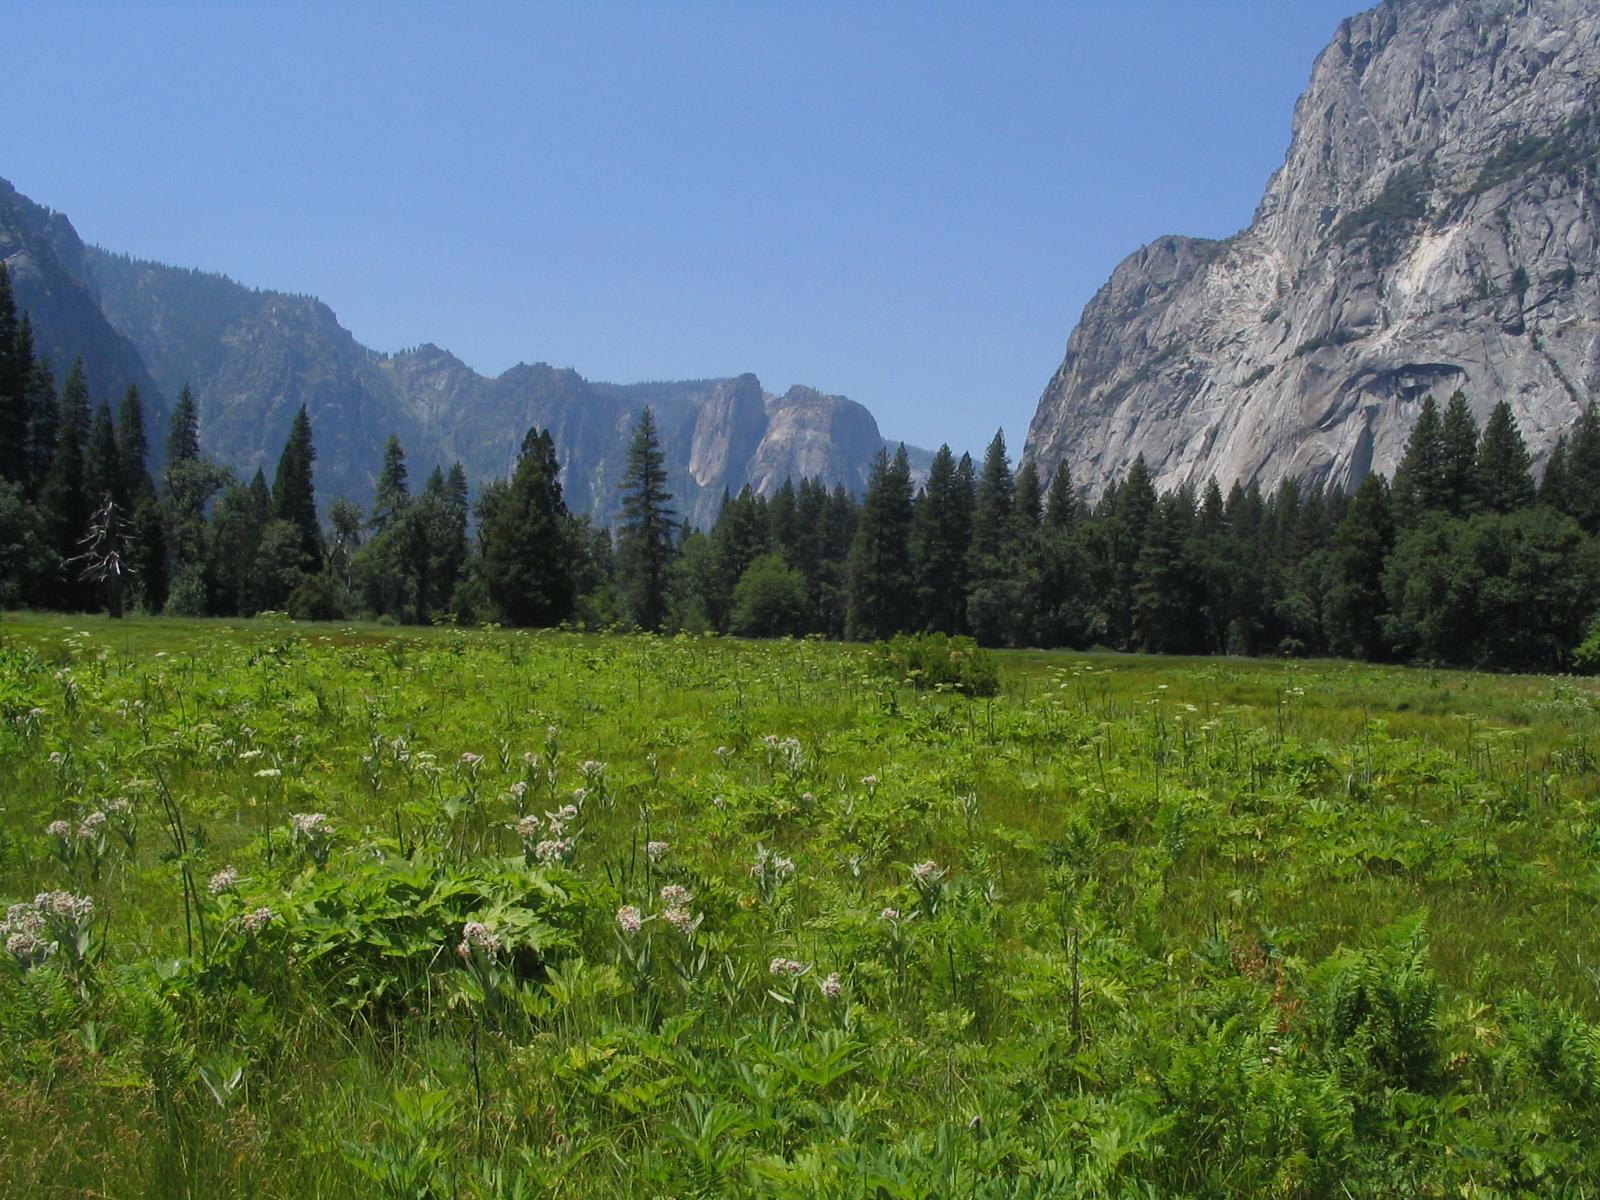 Yosemite National Park - Incredible Sight-Seeing Destination in California